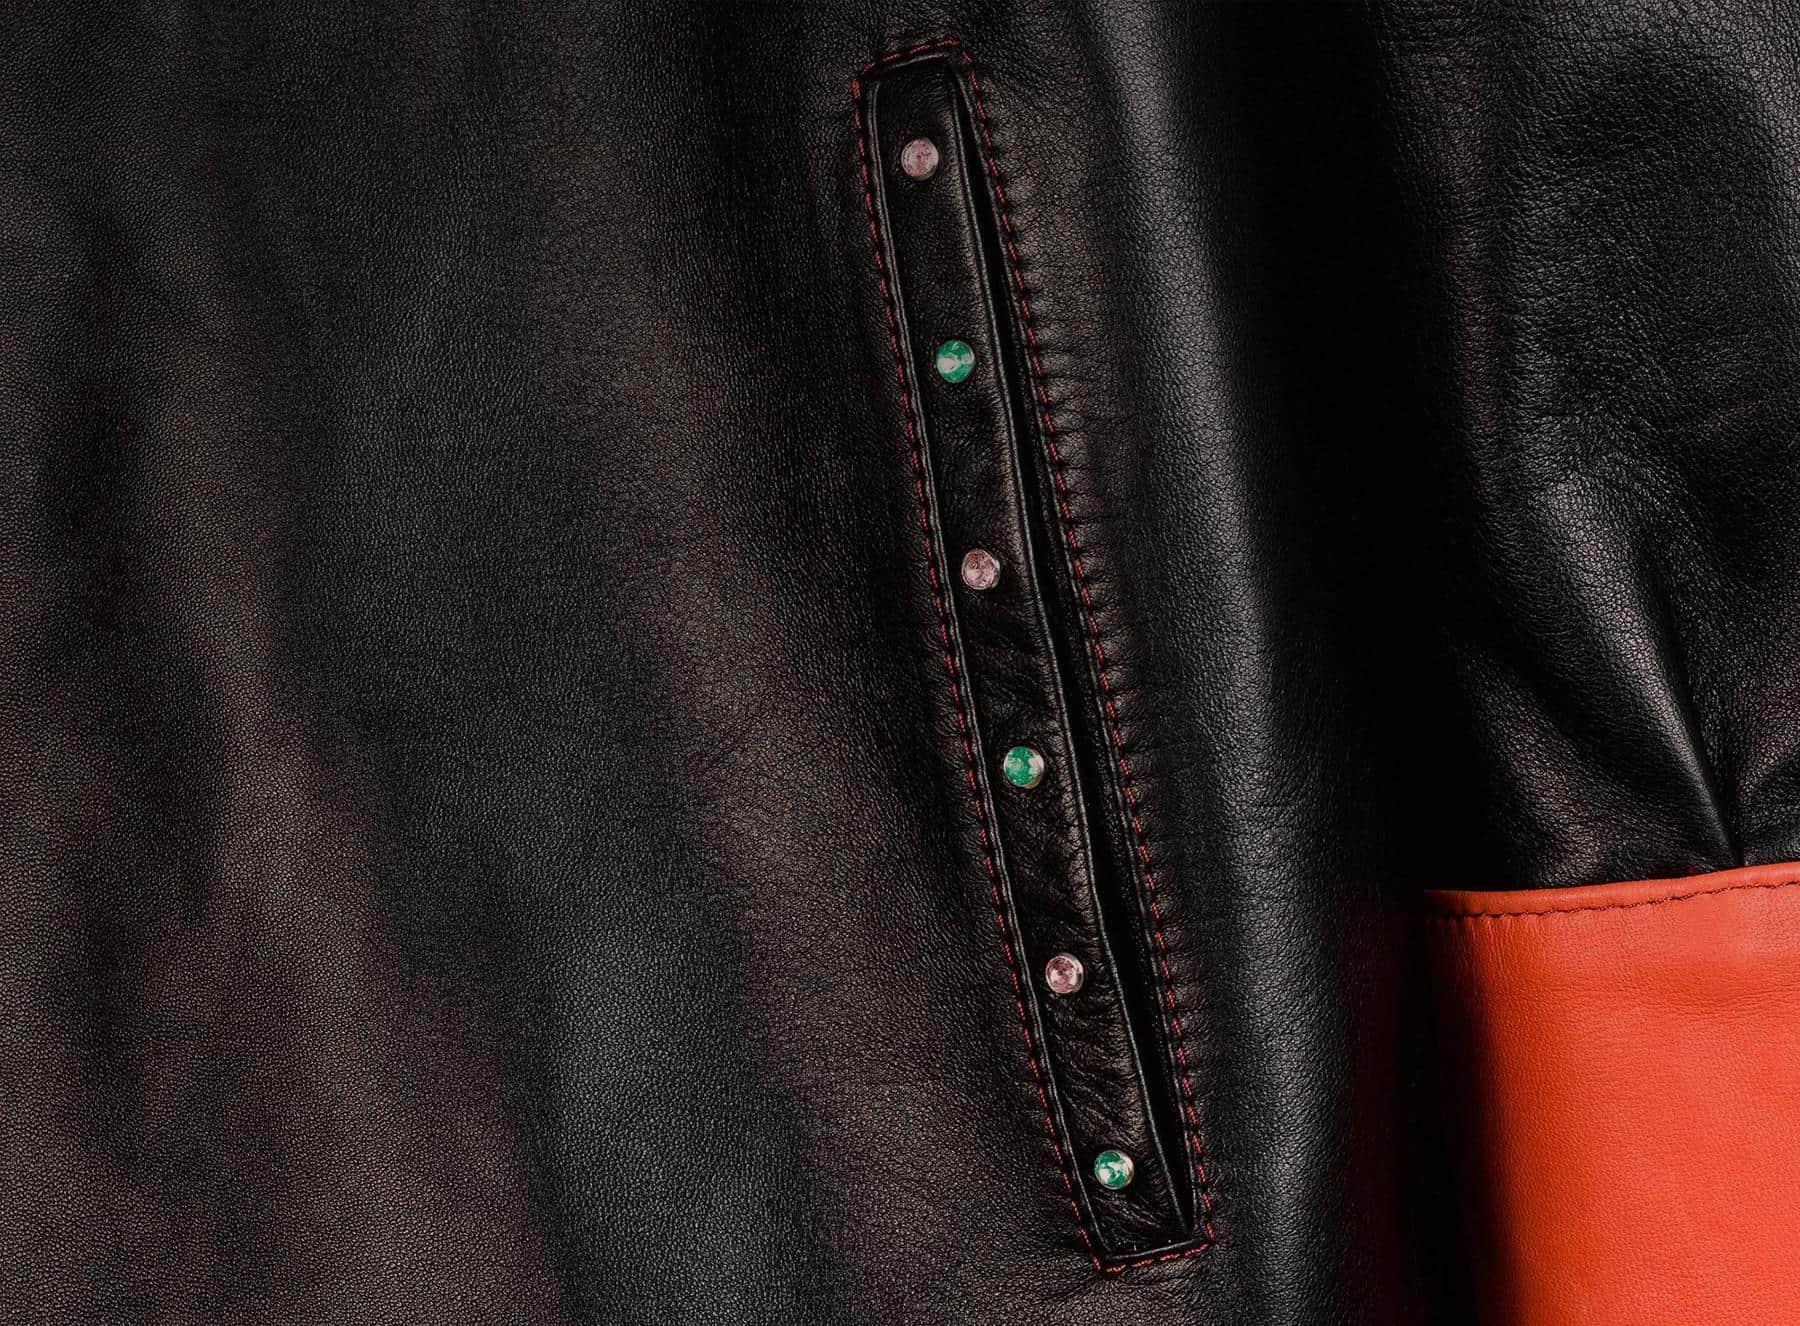 Bolsillo de Chaqueta de Piel Negra con puño naranja